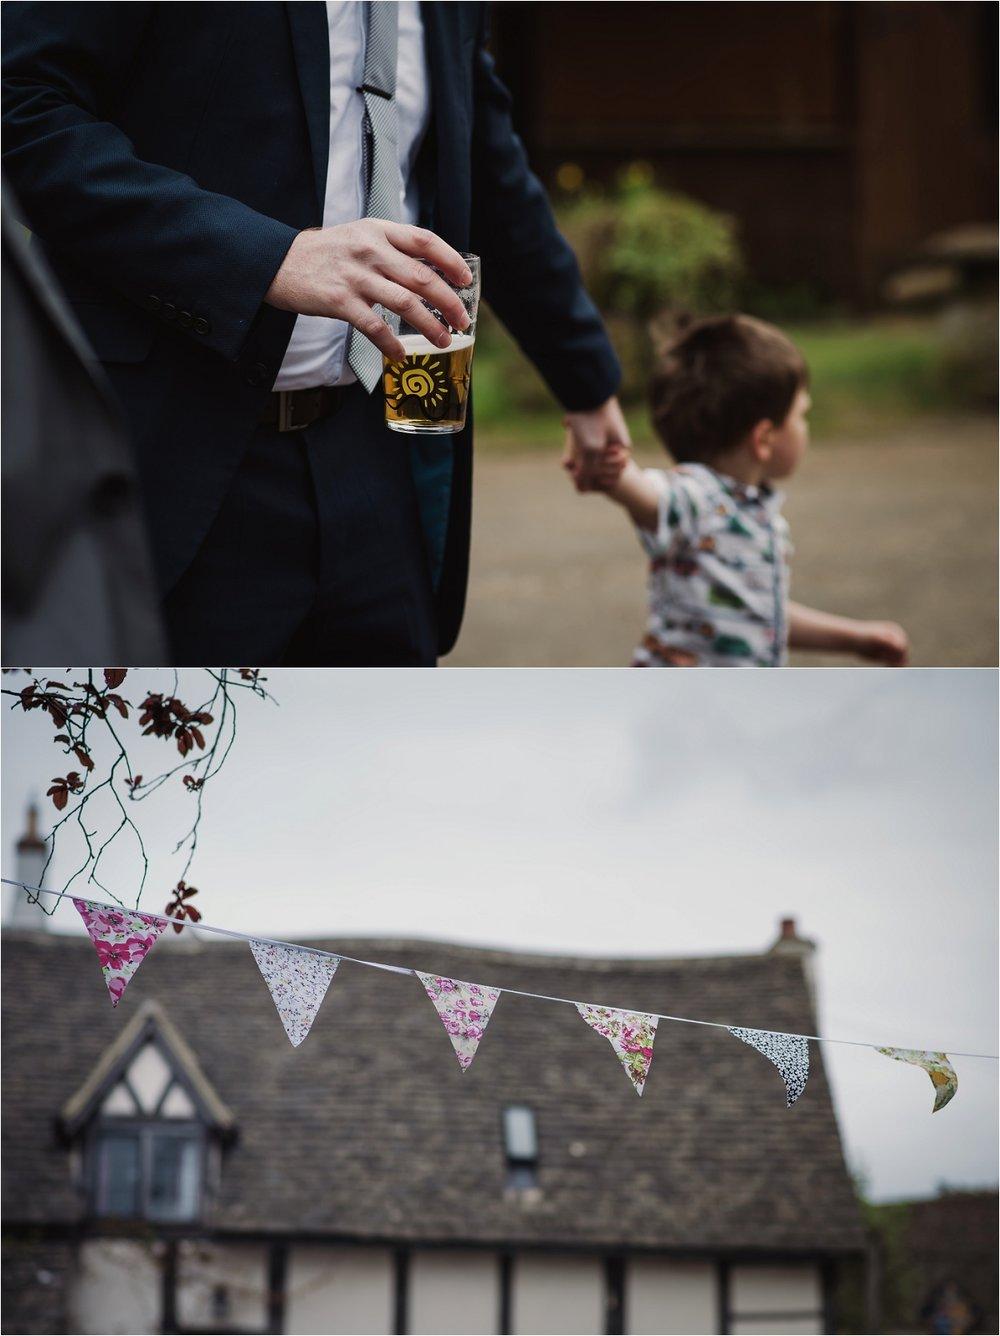 chris_emma_wedding_the_Fleece_inn_0021.jpg